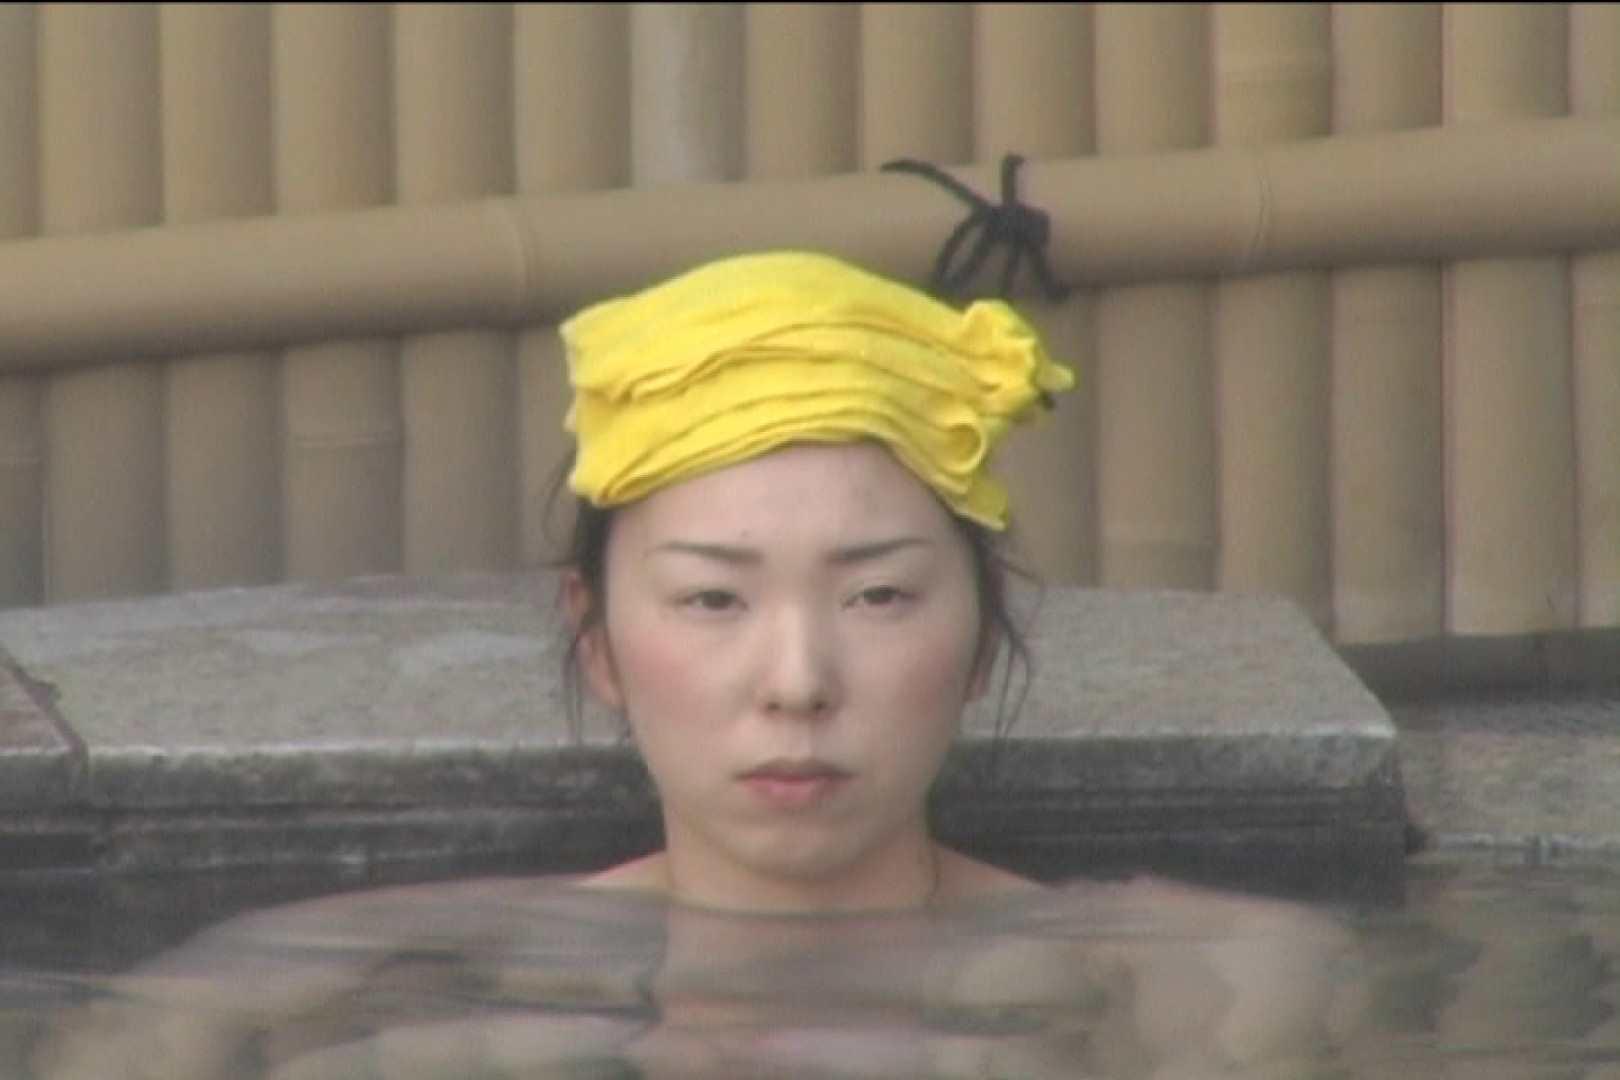 Aquaな露天風呂Vol.529 盗撮映像  51Pix 31